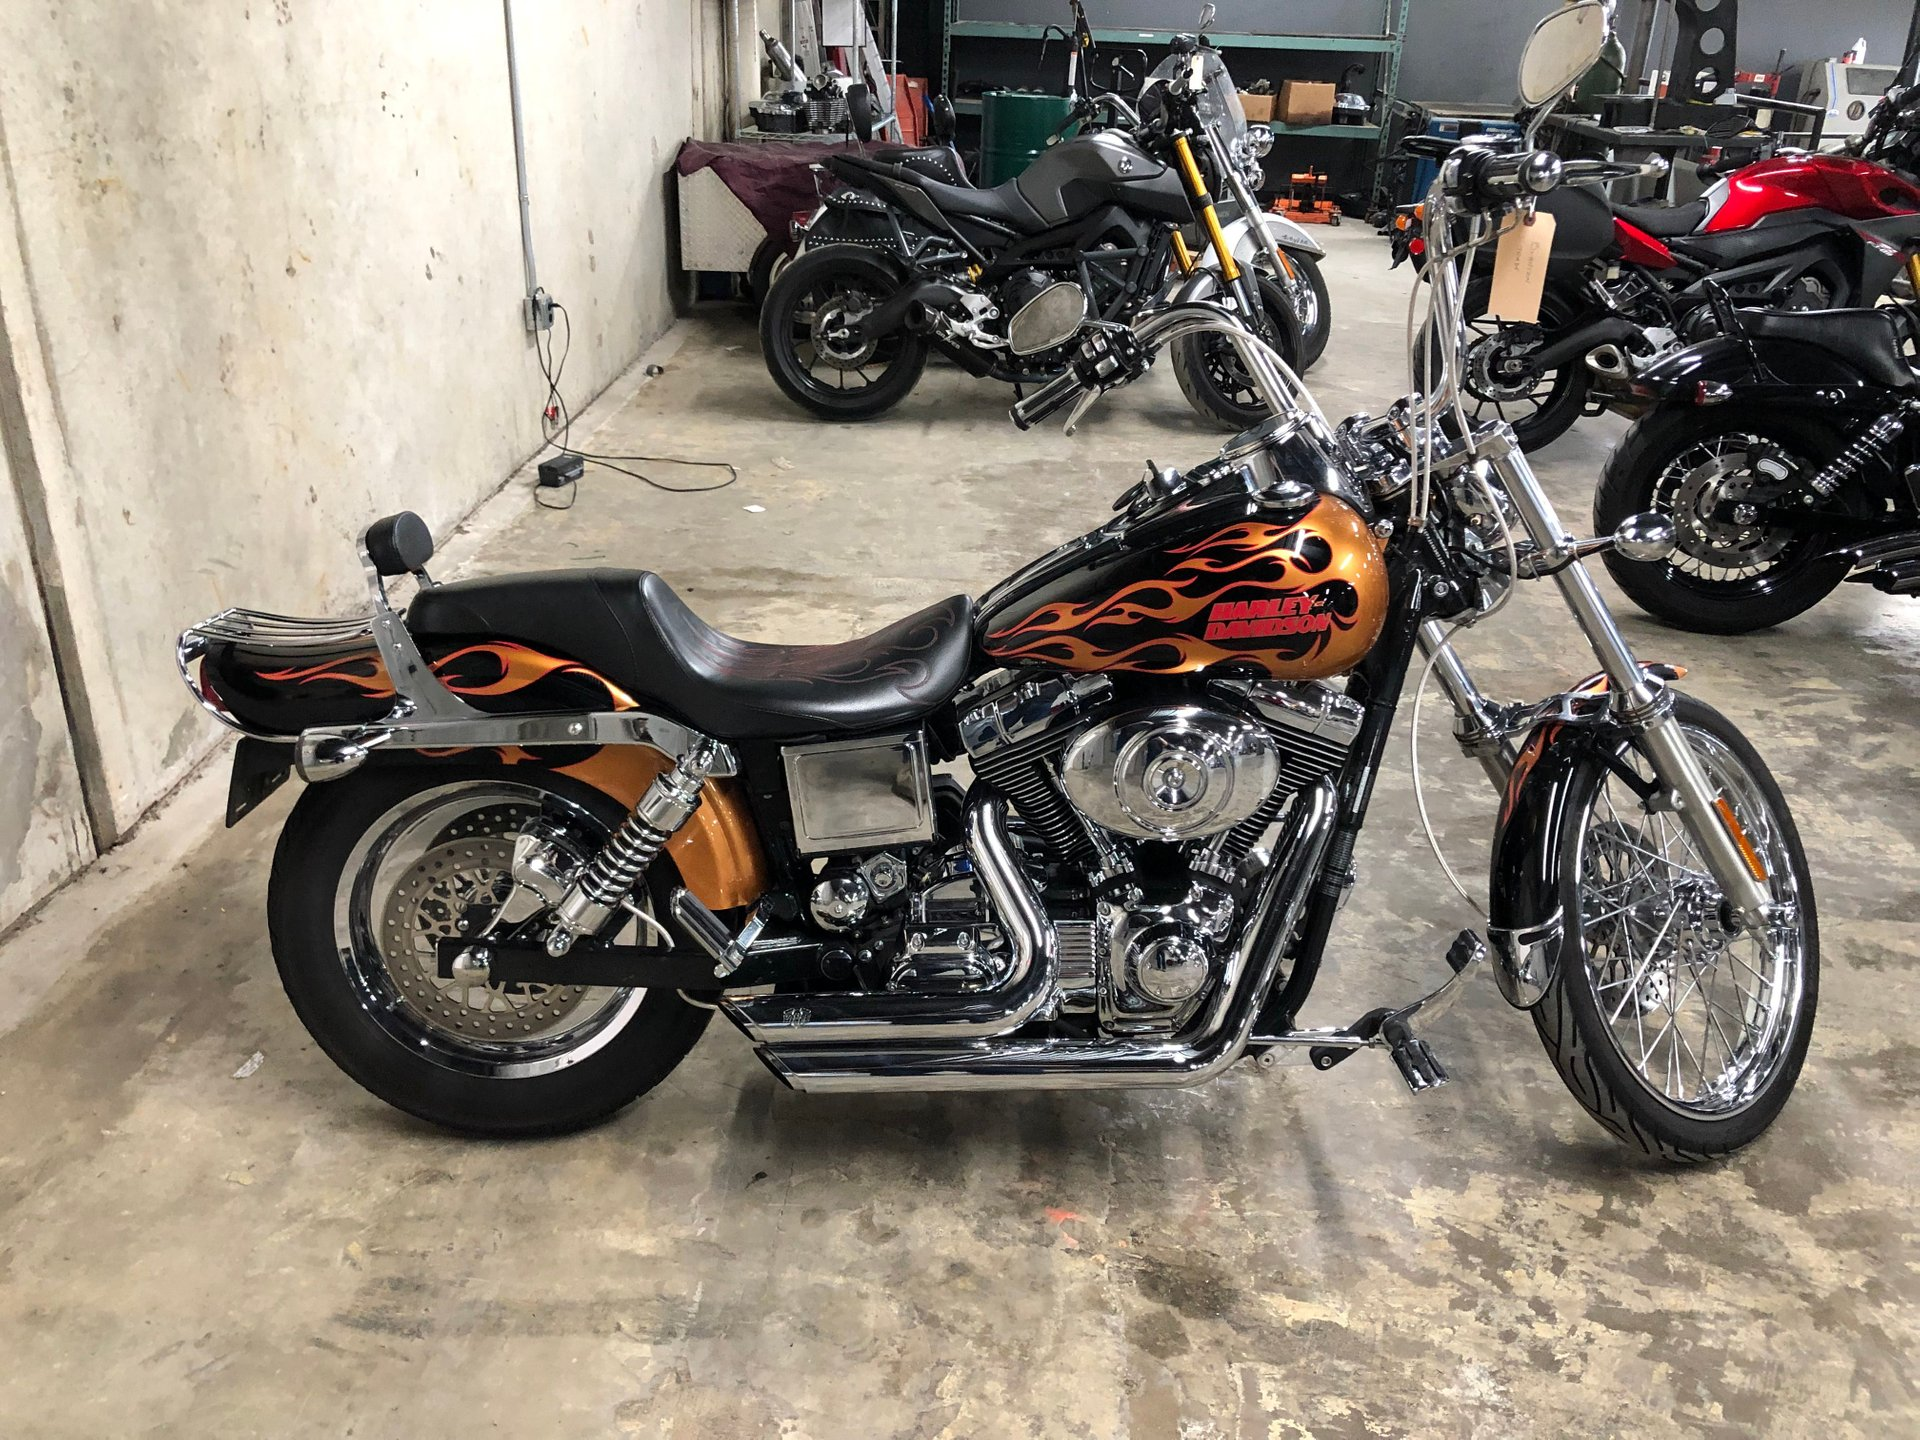 2004 Harley Davidson Dyna Wide Glide American Motorcycle Trading Company Used Harley Davidson Motorcycles